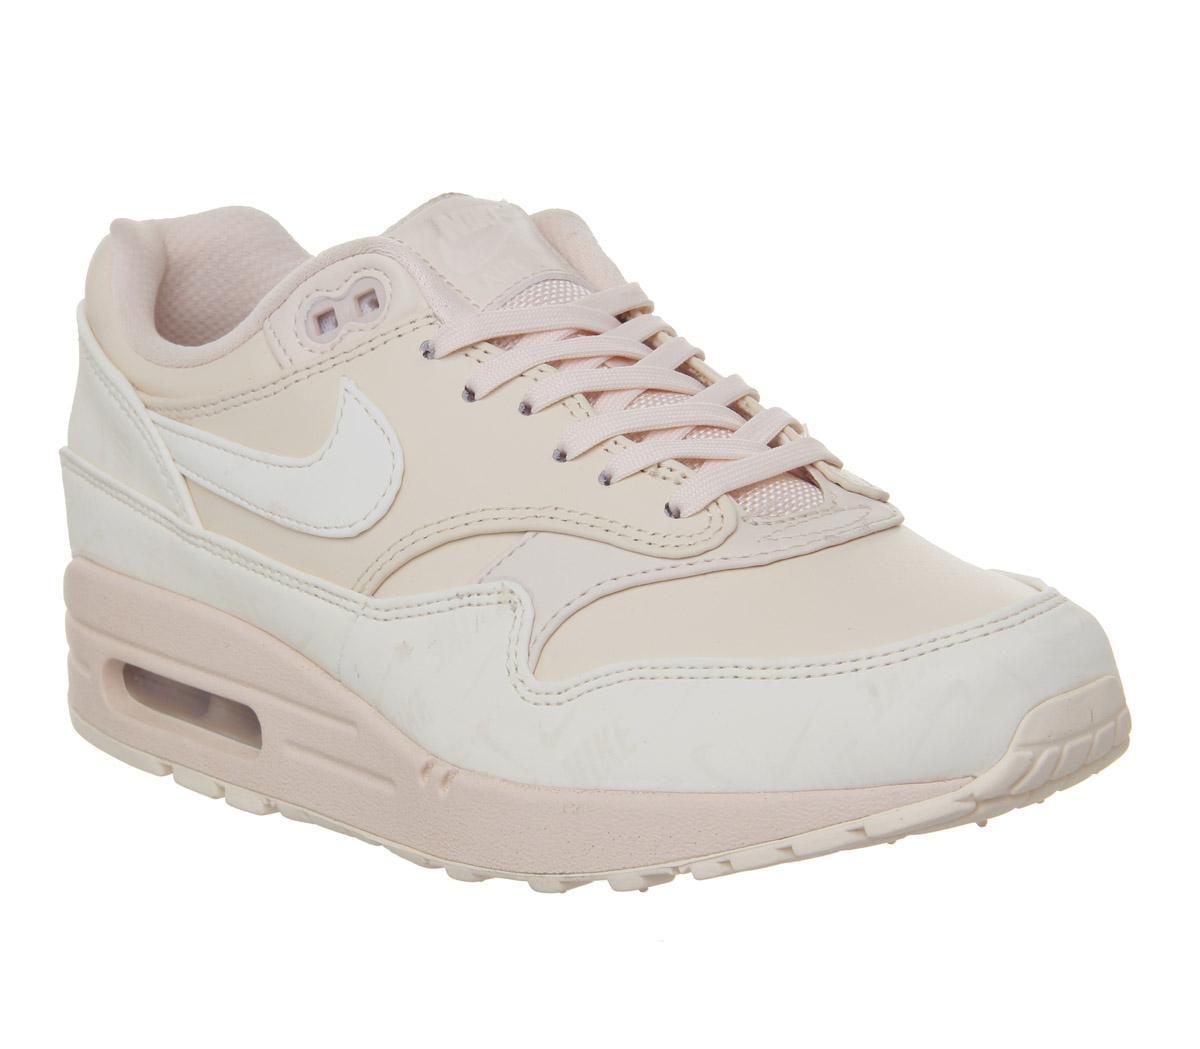 Nike Air Max 1 Trainers Guava Ice Lx Sneaker damen